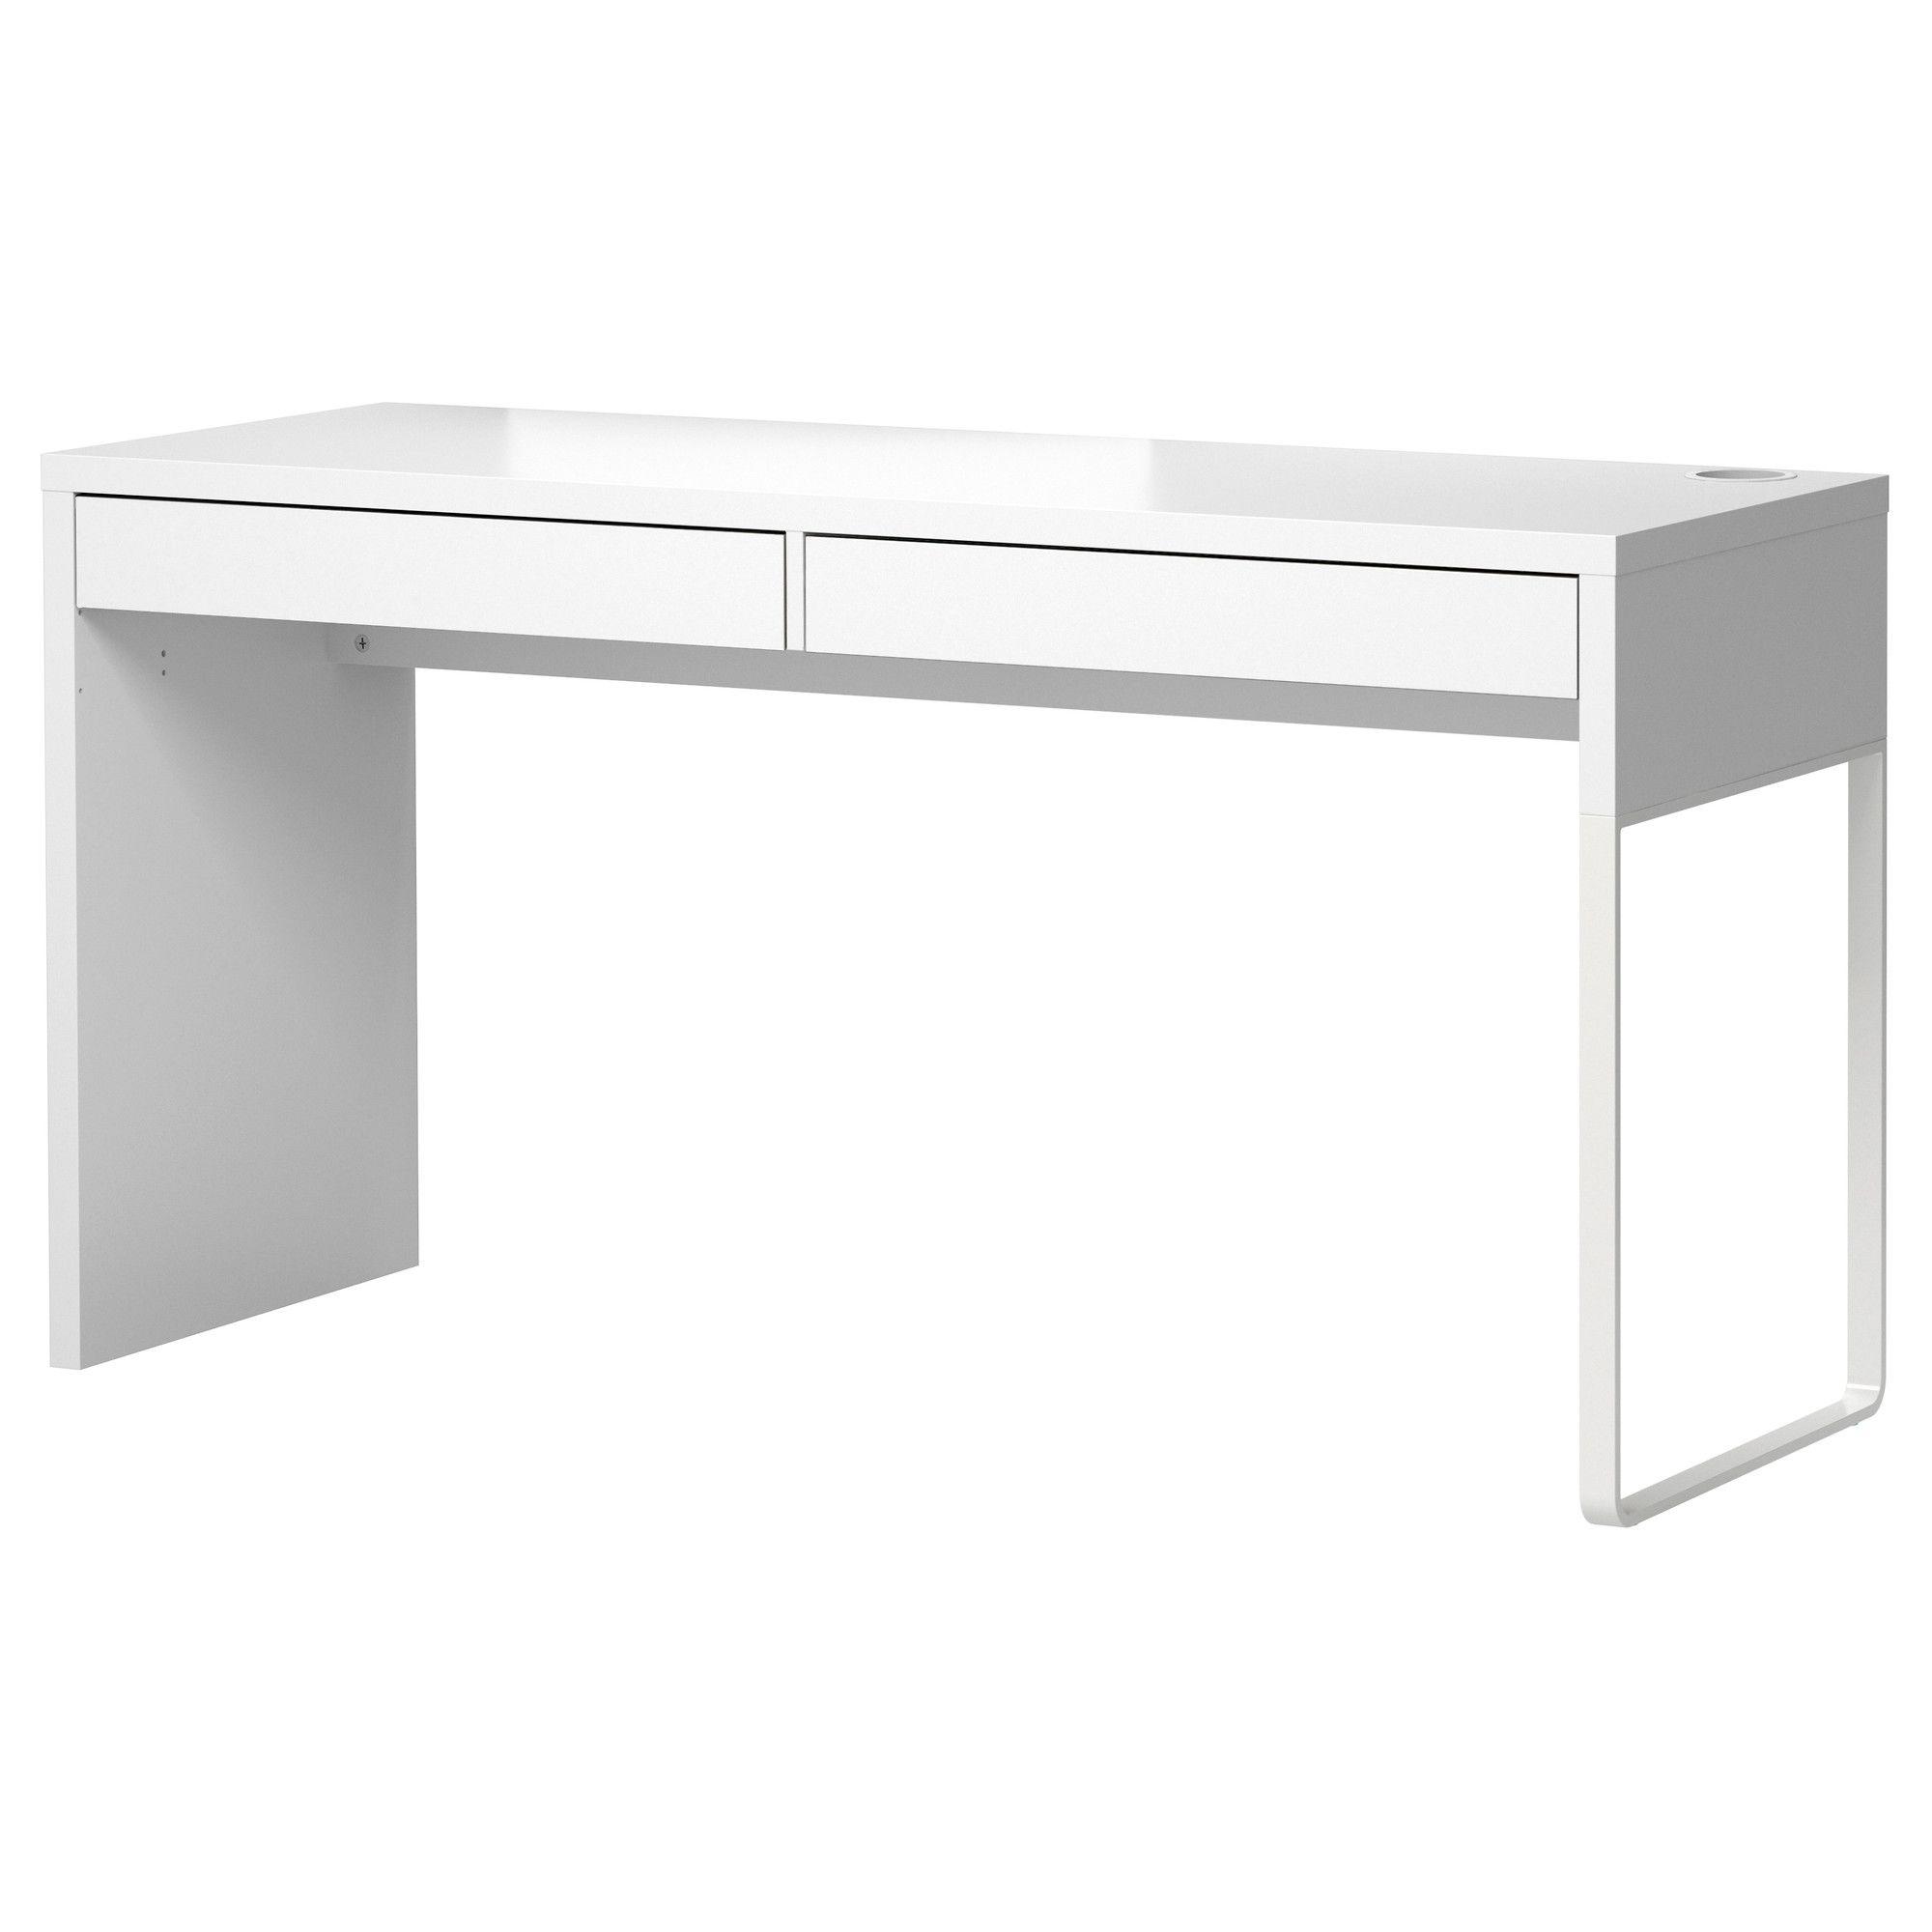 Micke Desk White 55 7 8x19 5 8 Ikea Micke Desk Micke Desk